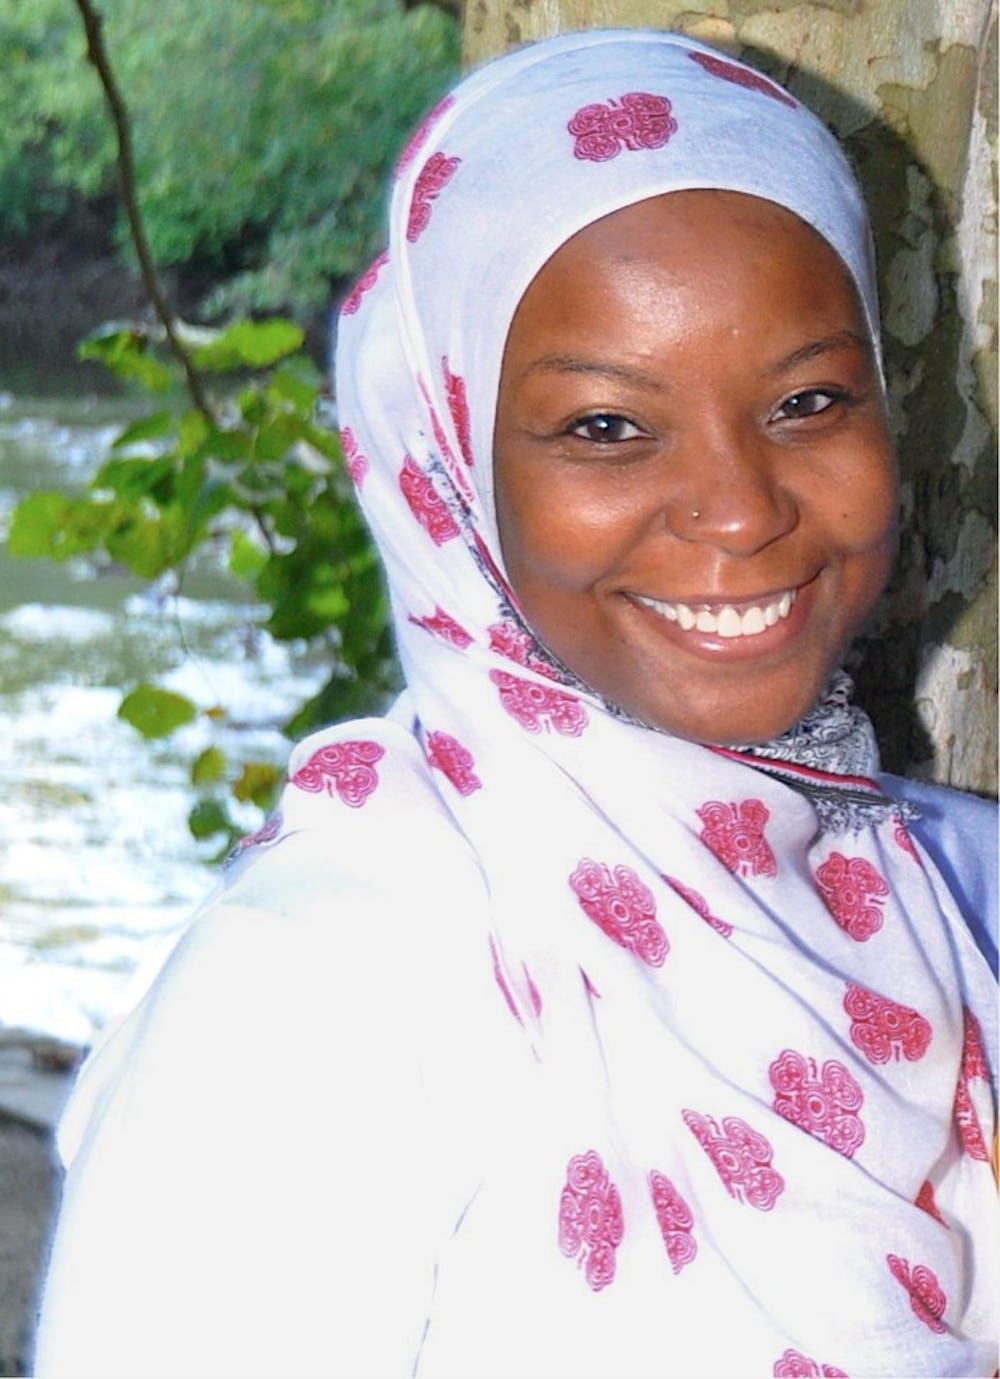 <p>Penn's Muslim Chaplain <strong>Kameelah Rashad</strong></p>